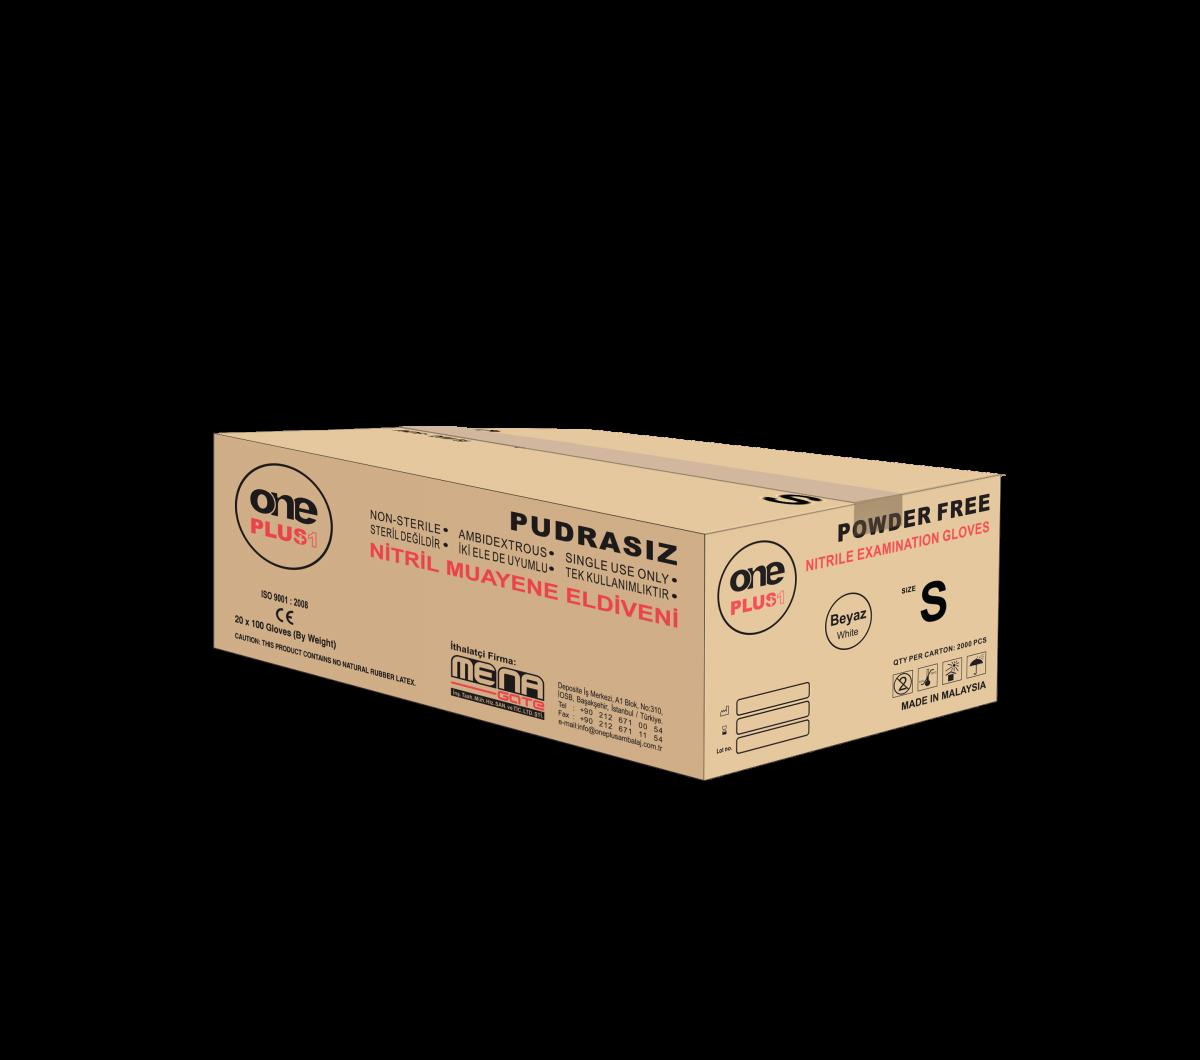 OnePlus Ambalaj Nitril Pudrasiz Muayene Eldiveni Siyah koli (20 paket × 100'lü paket) S